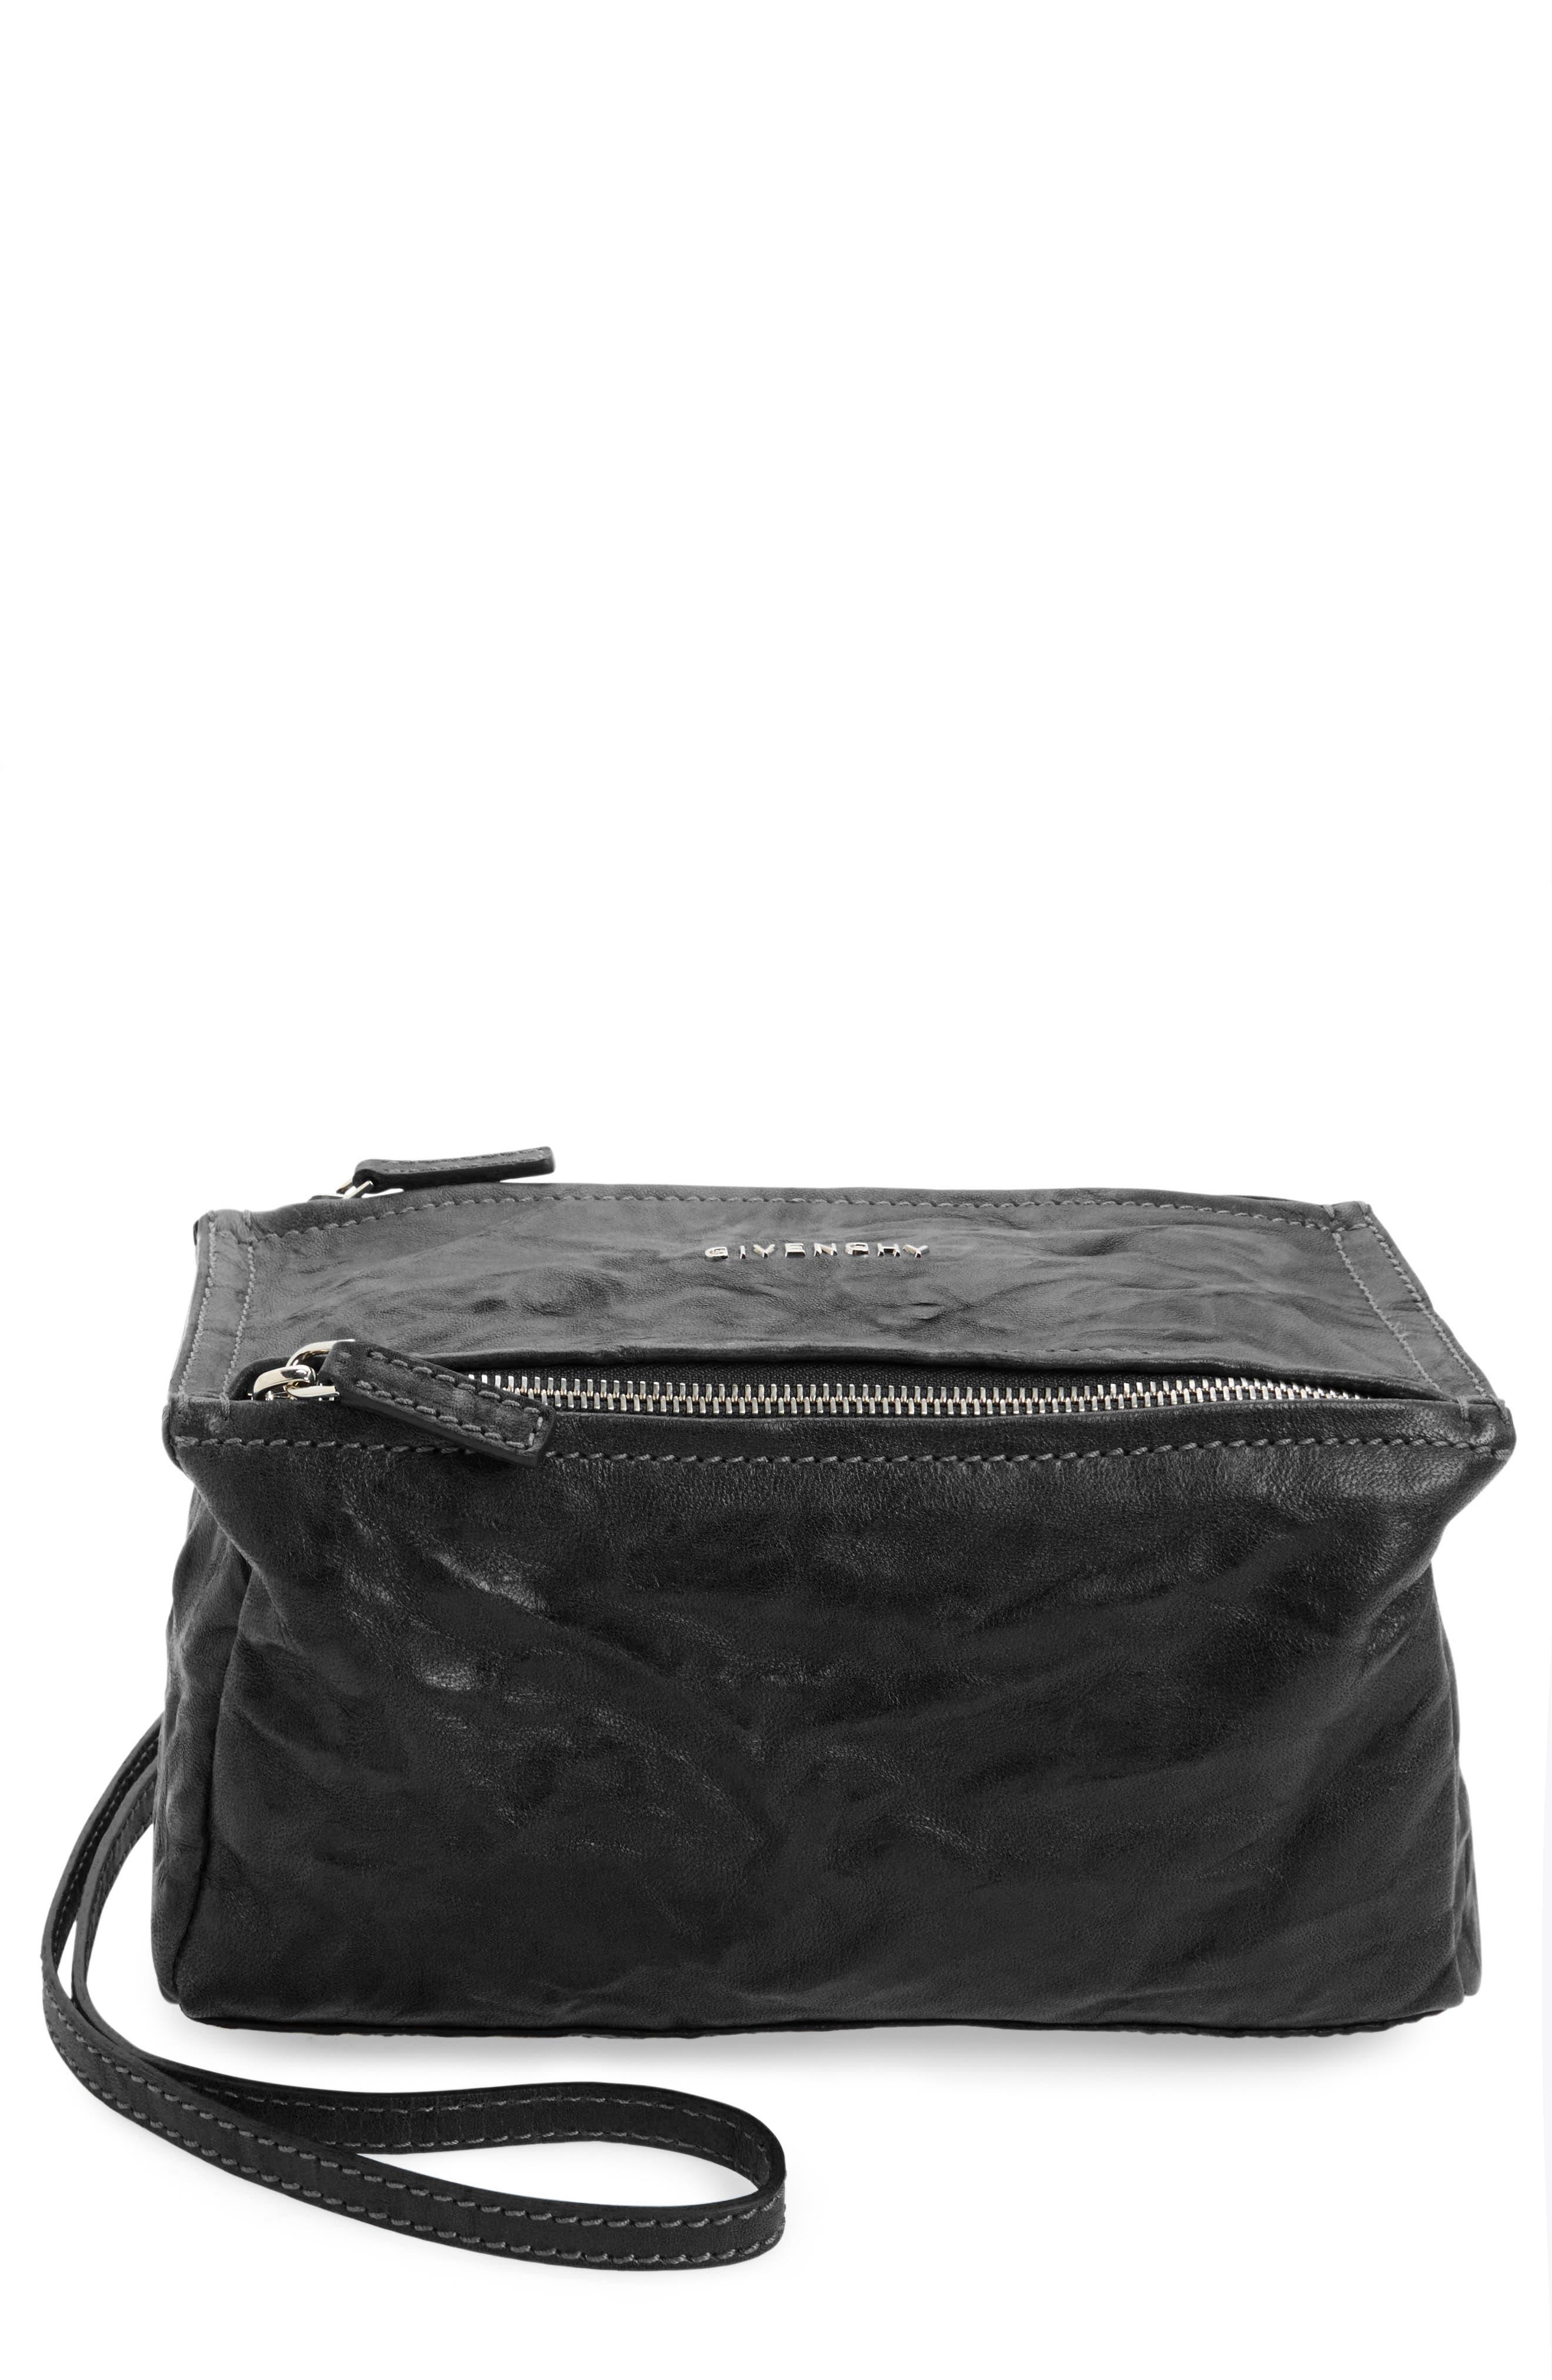 'Mini Pepe Pandora' Leather Shoulder Bag,                             Main thumbnail 1, color,                             BLACK